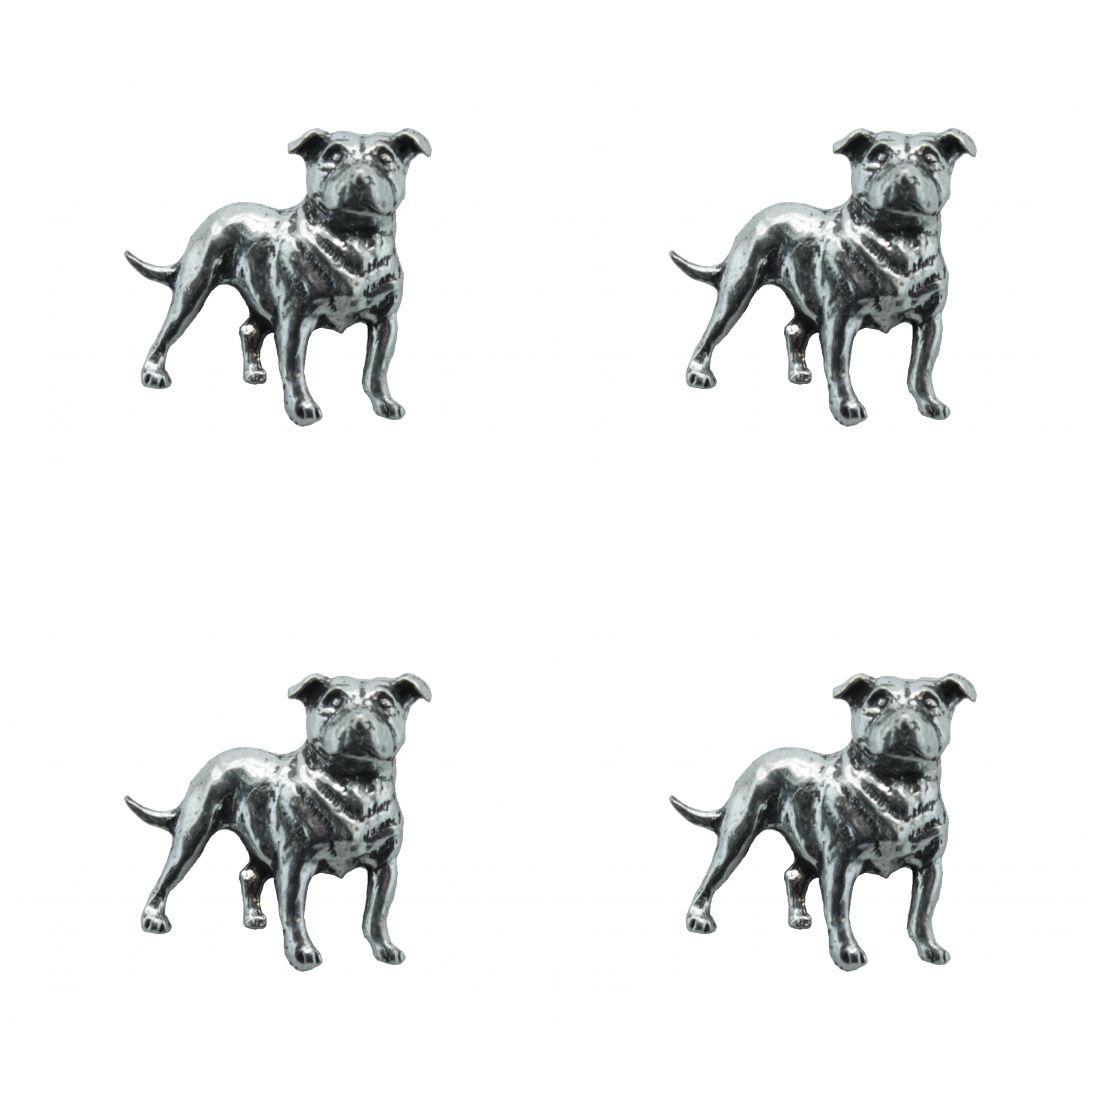 4 x Pin Anstecker Badge Staffordshire Bull Terrier, 2,9x2,6cm